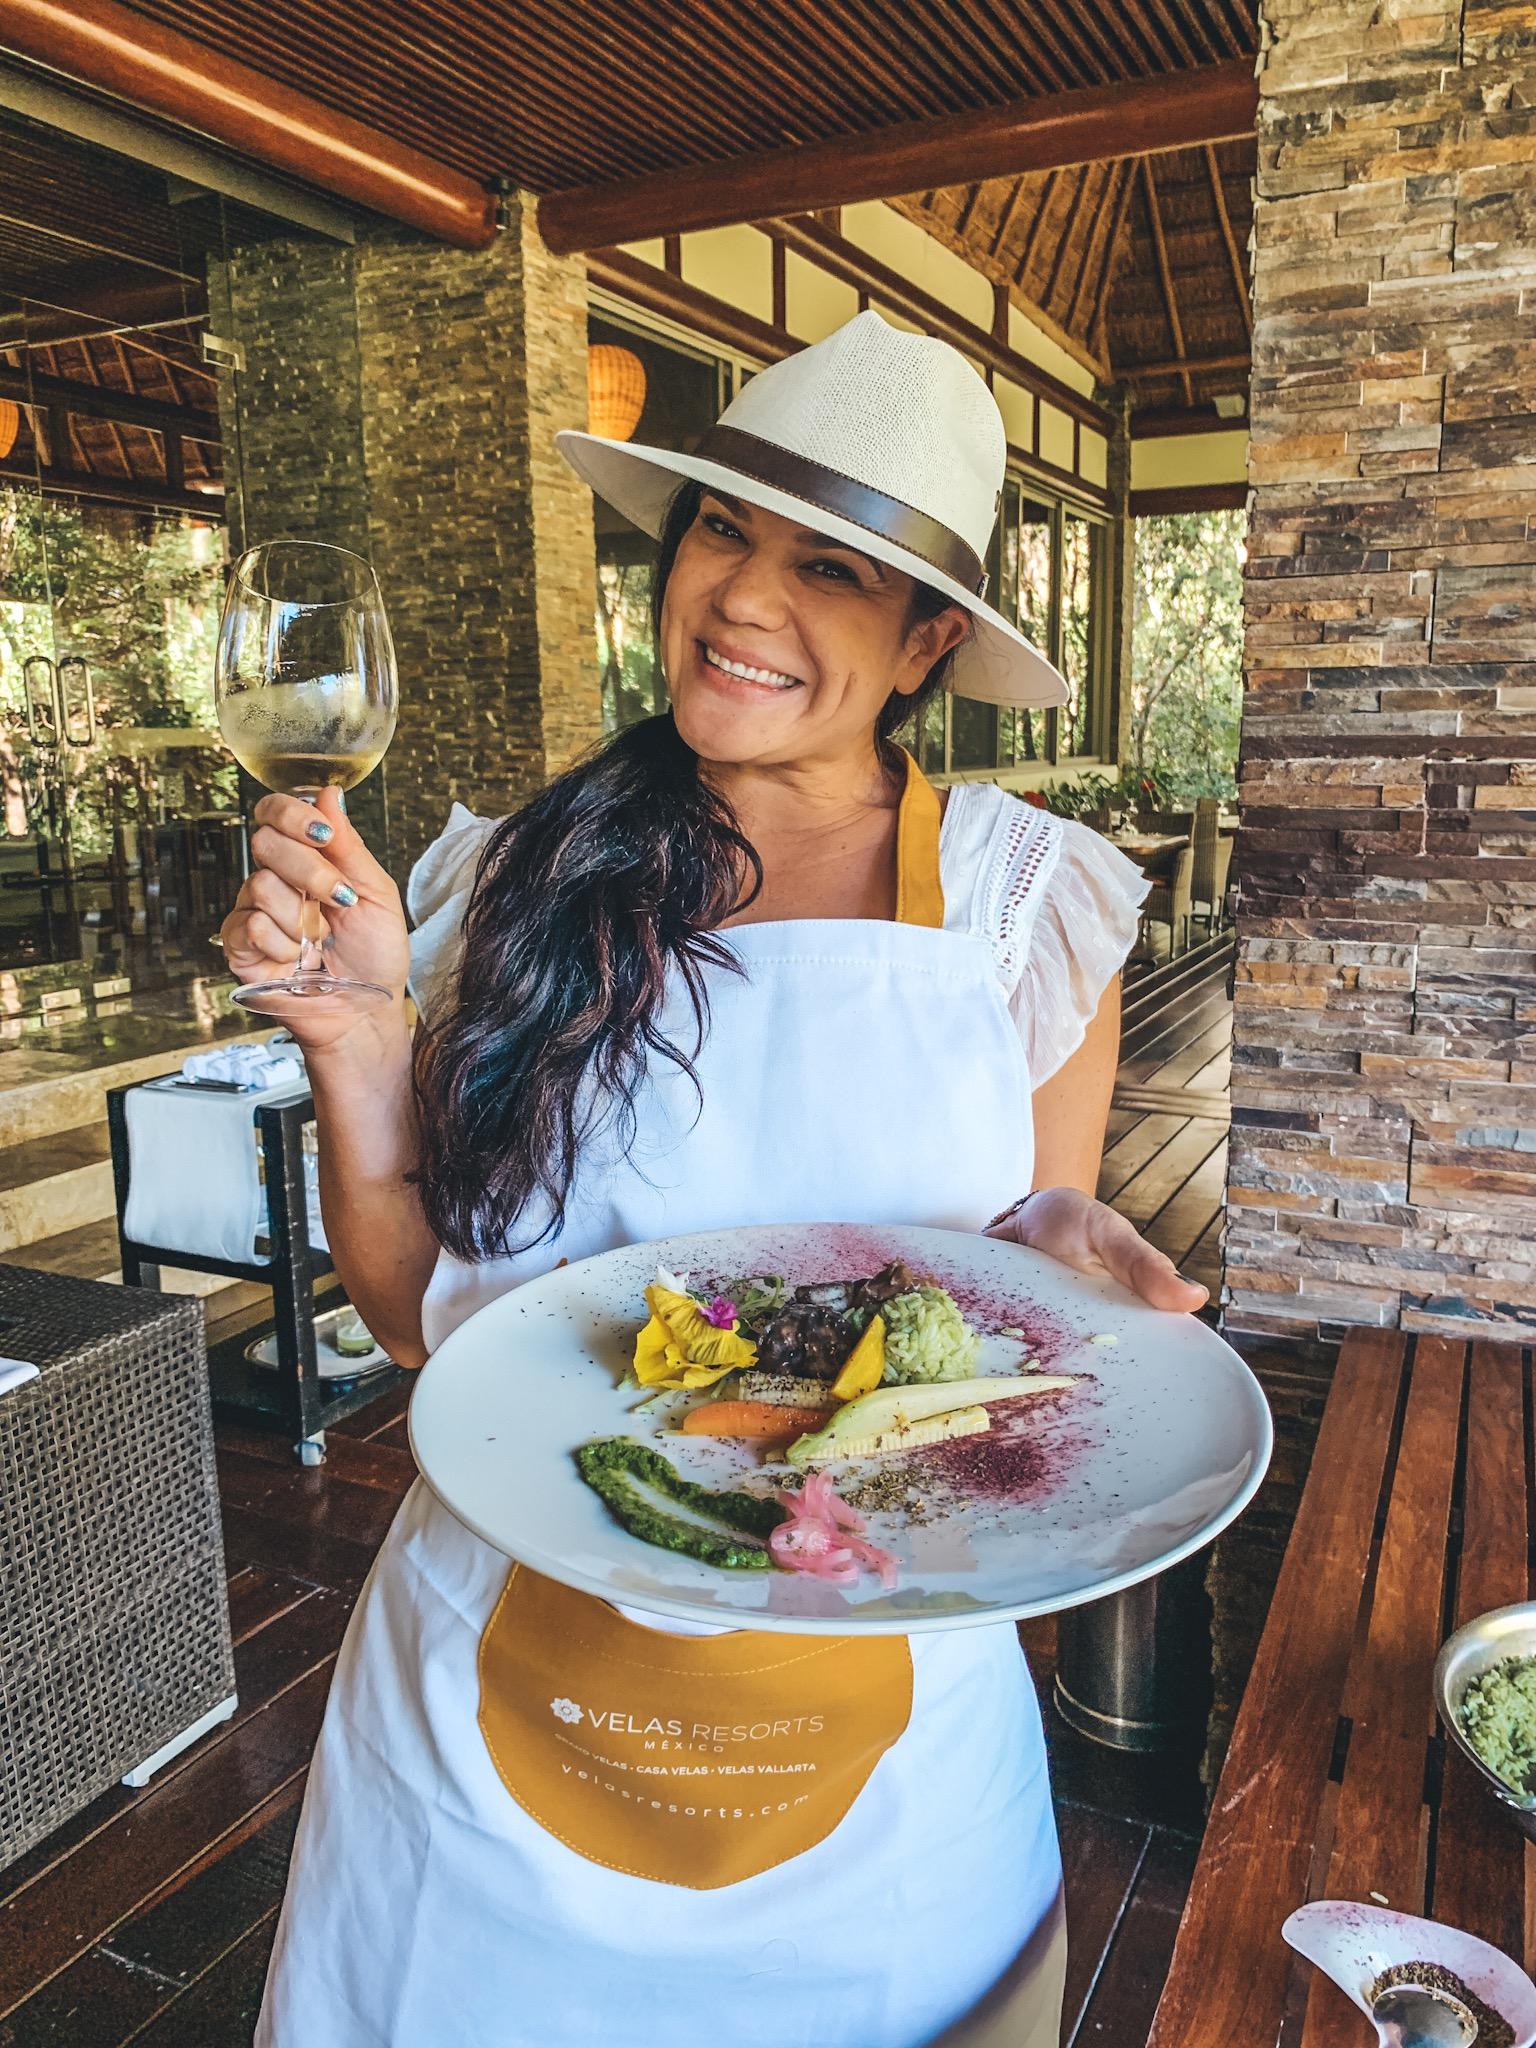 Grand Velas Riviera Maya Luxury All- Inclusive Resort and Spa | Photo by Erika Beach